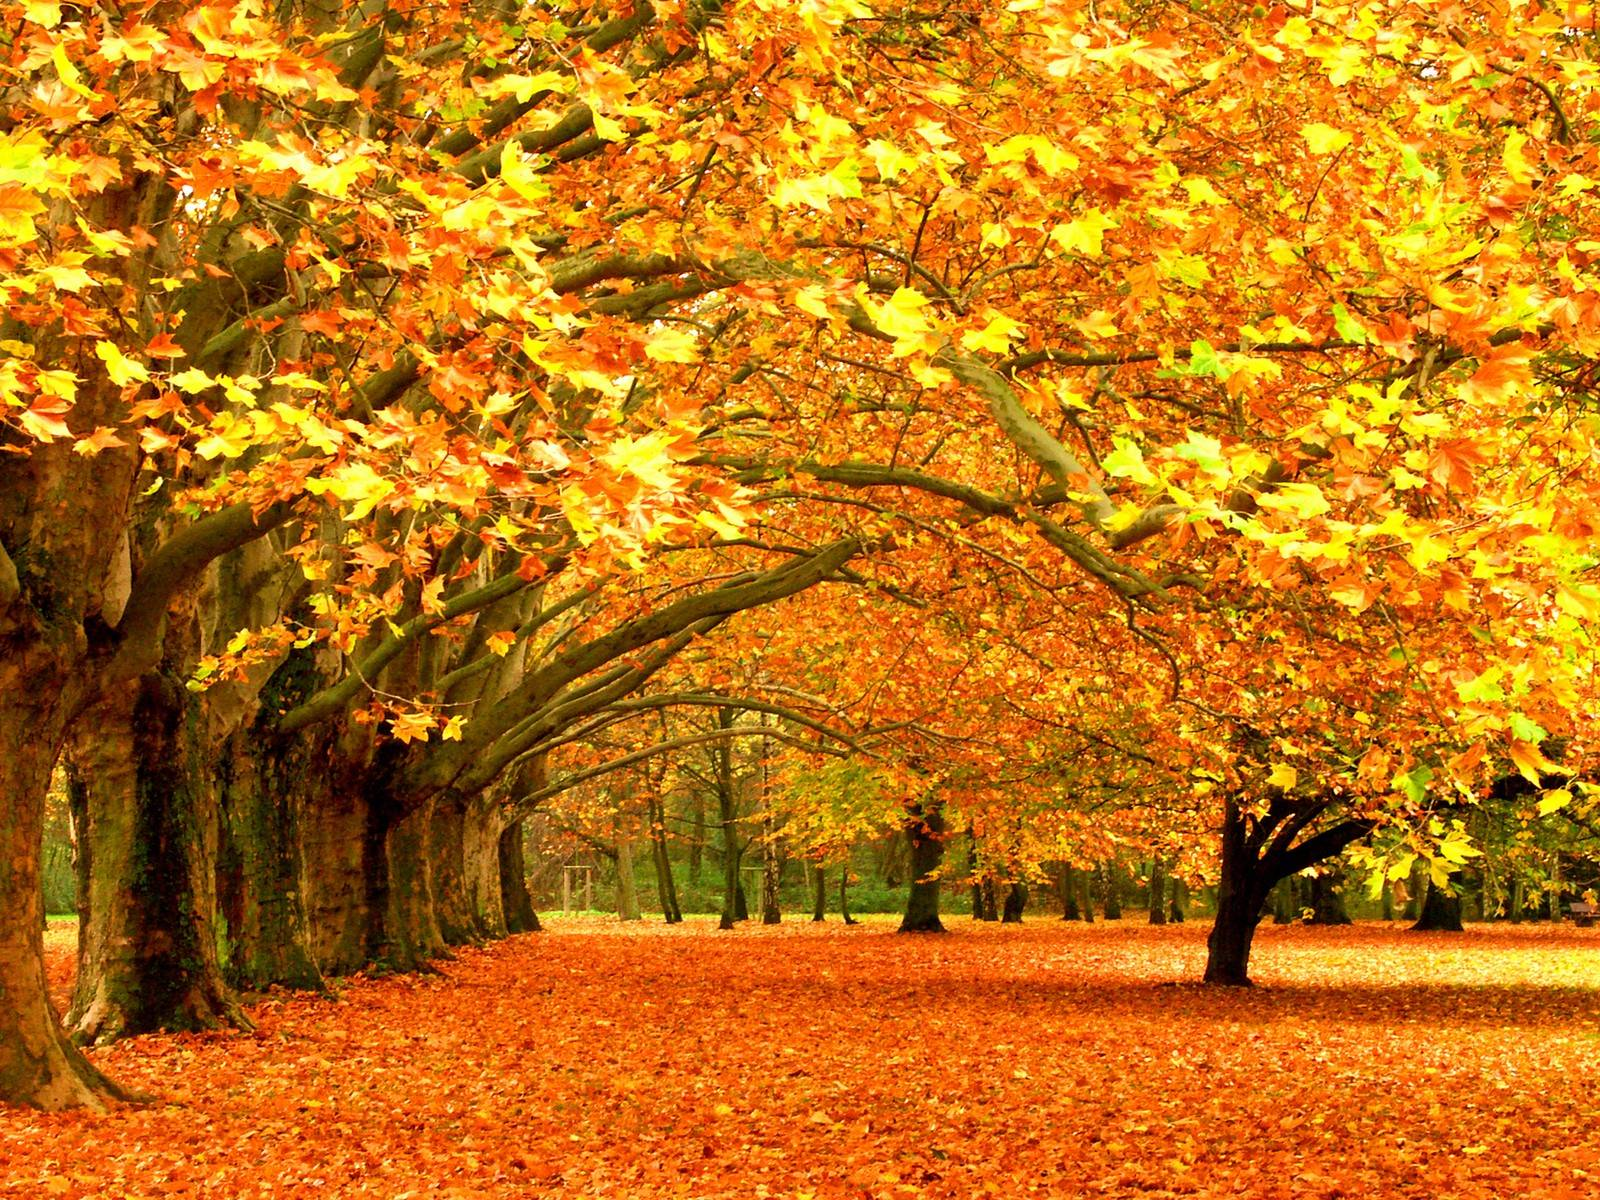 Autumn Wallpapers For Desktop Wallpaper Cave